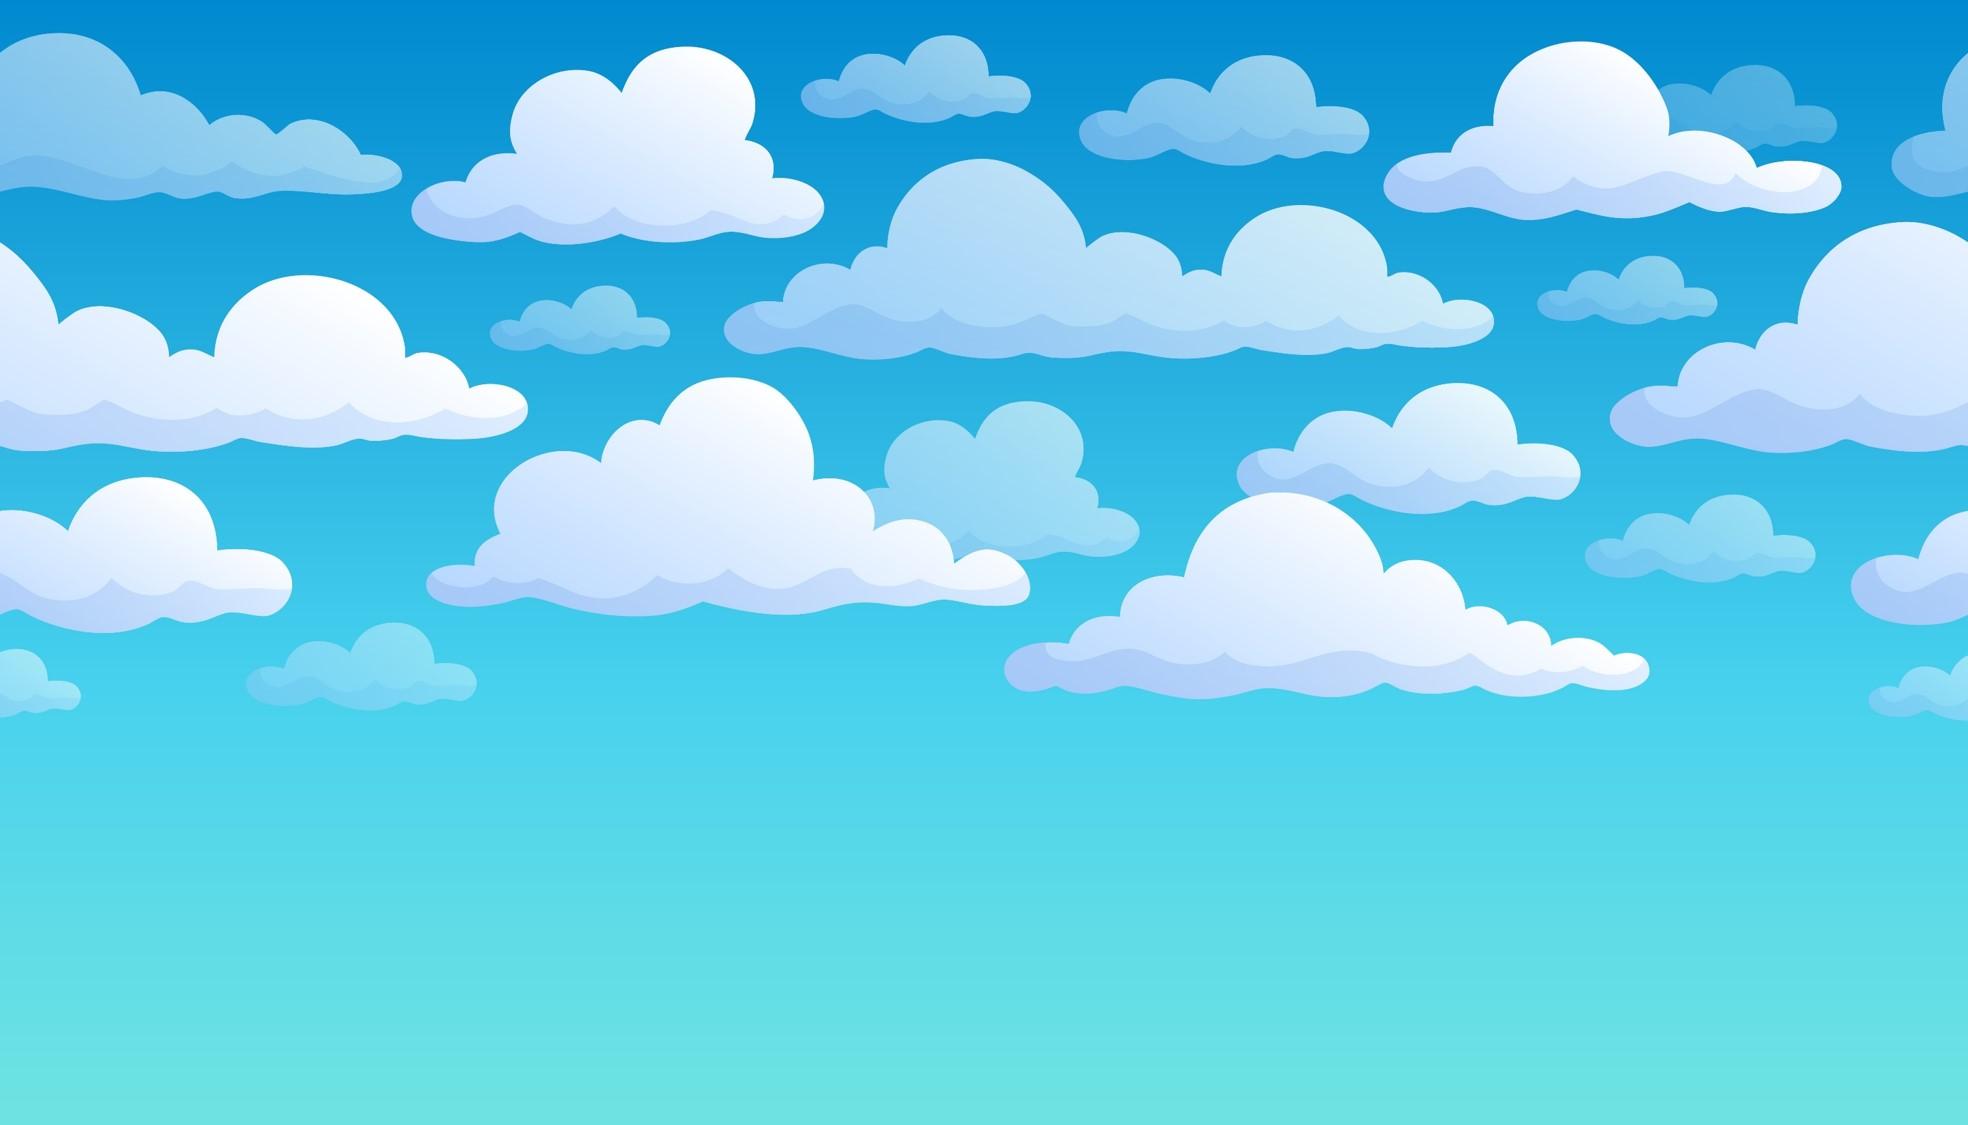 Free Sky Cartoon Cliparts, Download Free Clip Art, Free Clip Art on.